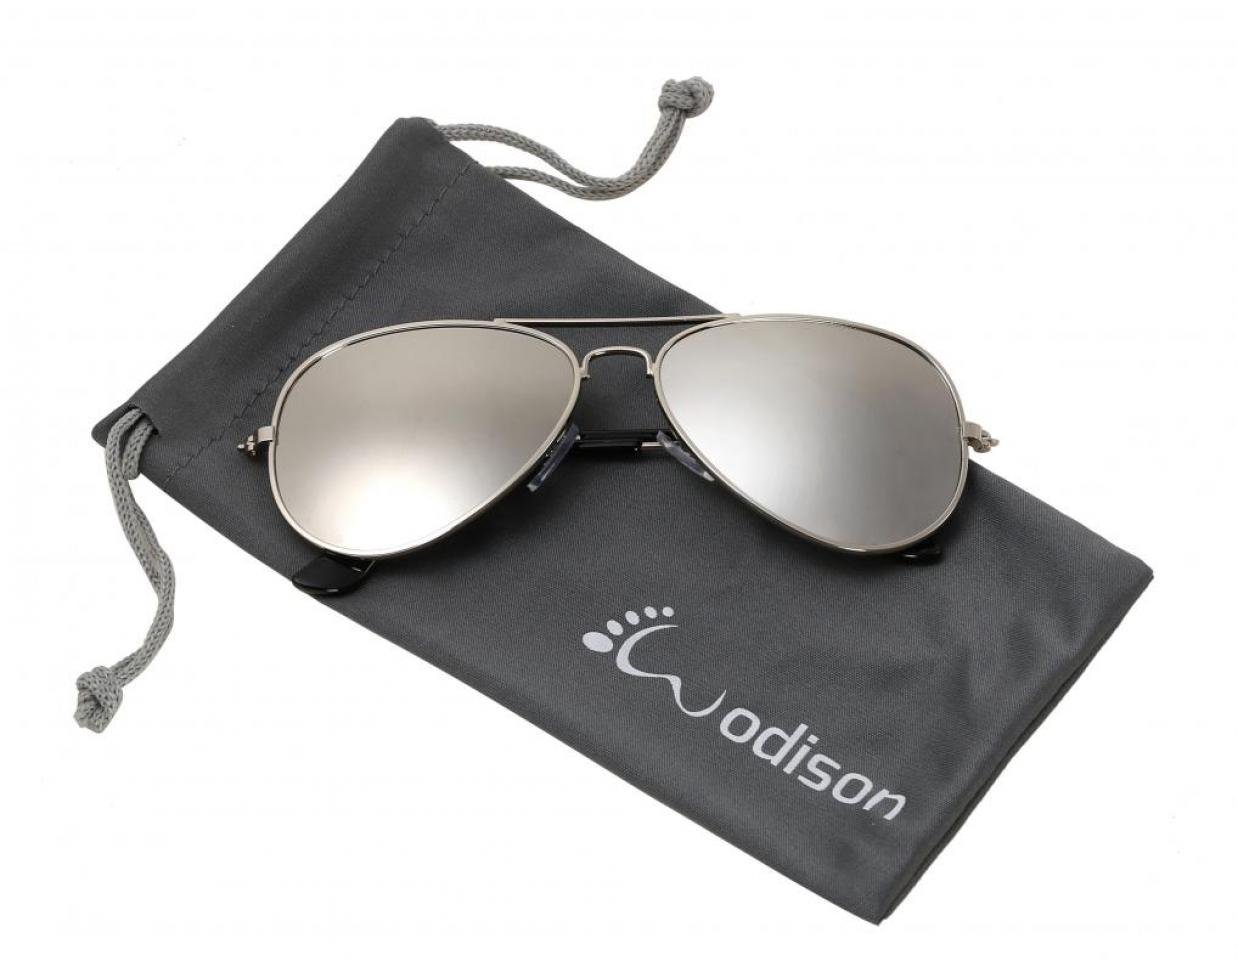 WODISON Classic Aviator Sunglasses Reflective Metal Frame for Kids Children Unisex RoyBella